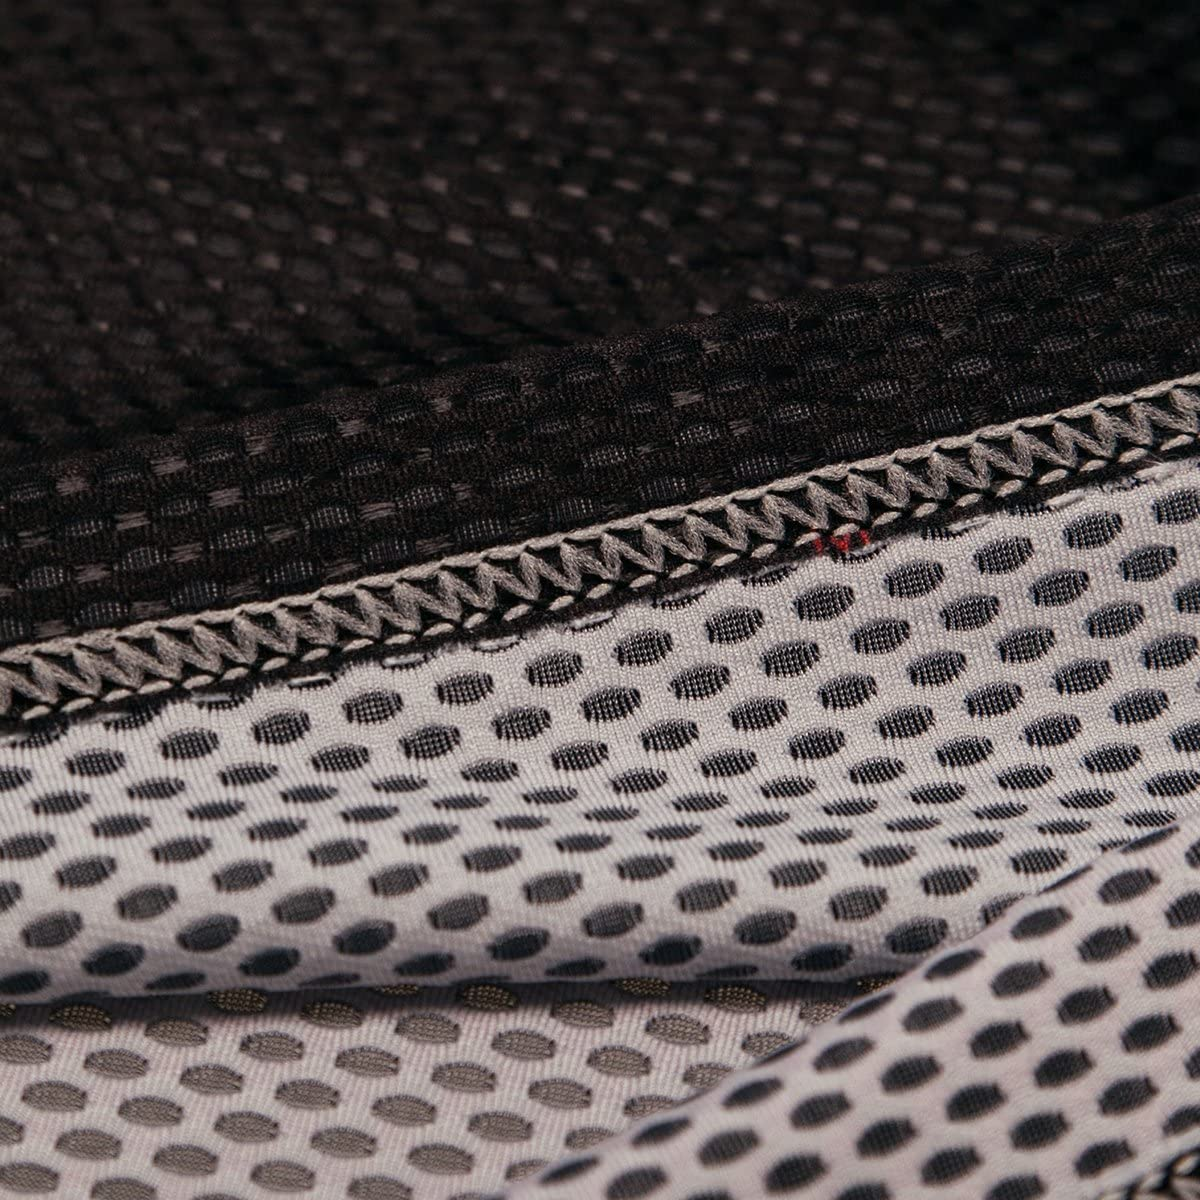 Chaleco de ciclismo para hombre CYCEARTH ropa interior para bicicleta al aire libre capa base sin mangas